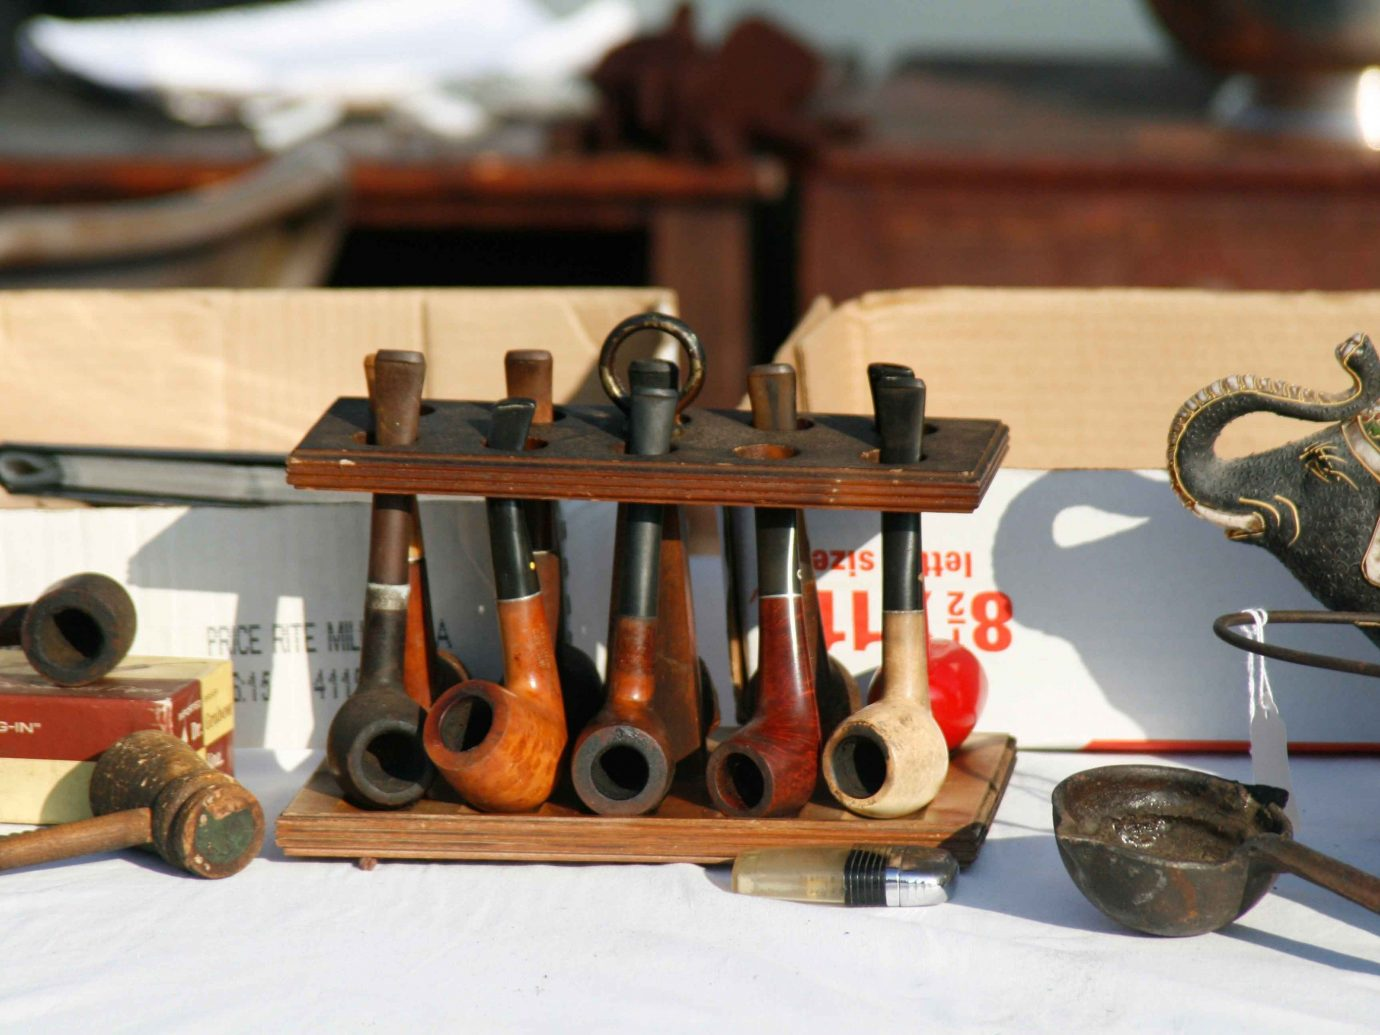 Trip Ideas indoor firearm steam engine scale model gun guitar toy wood plucked string instruments weapon vehicle